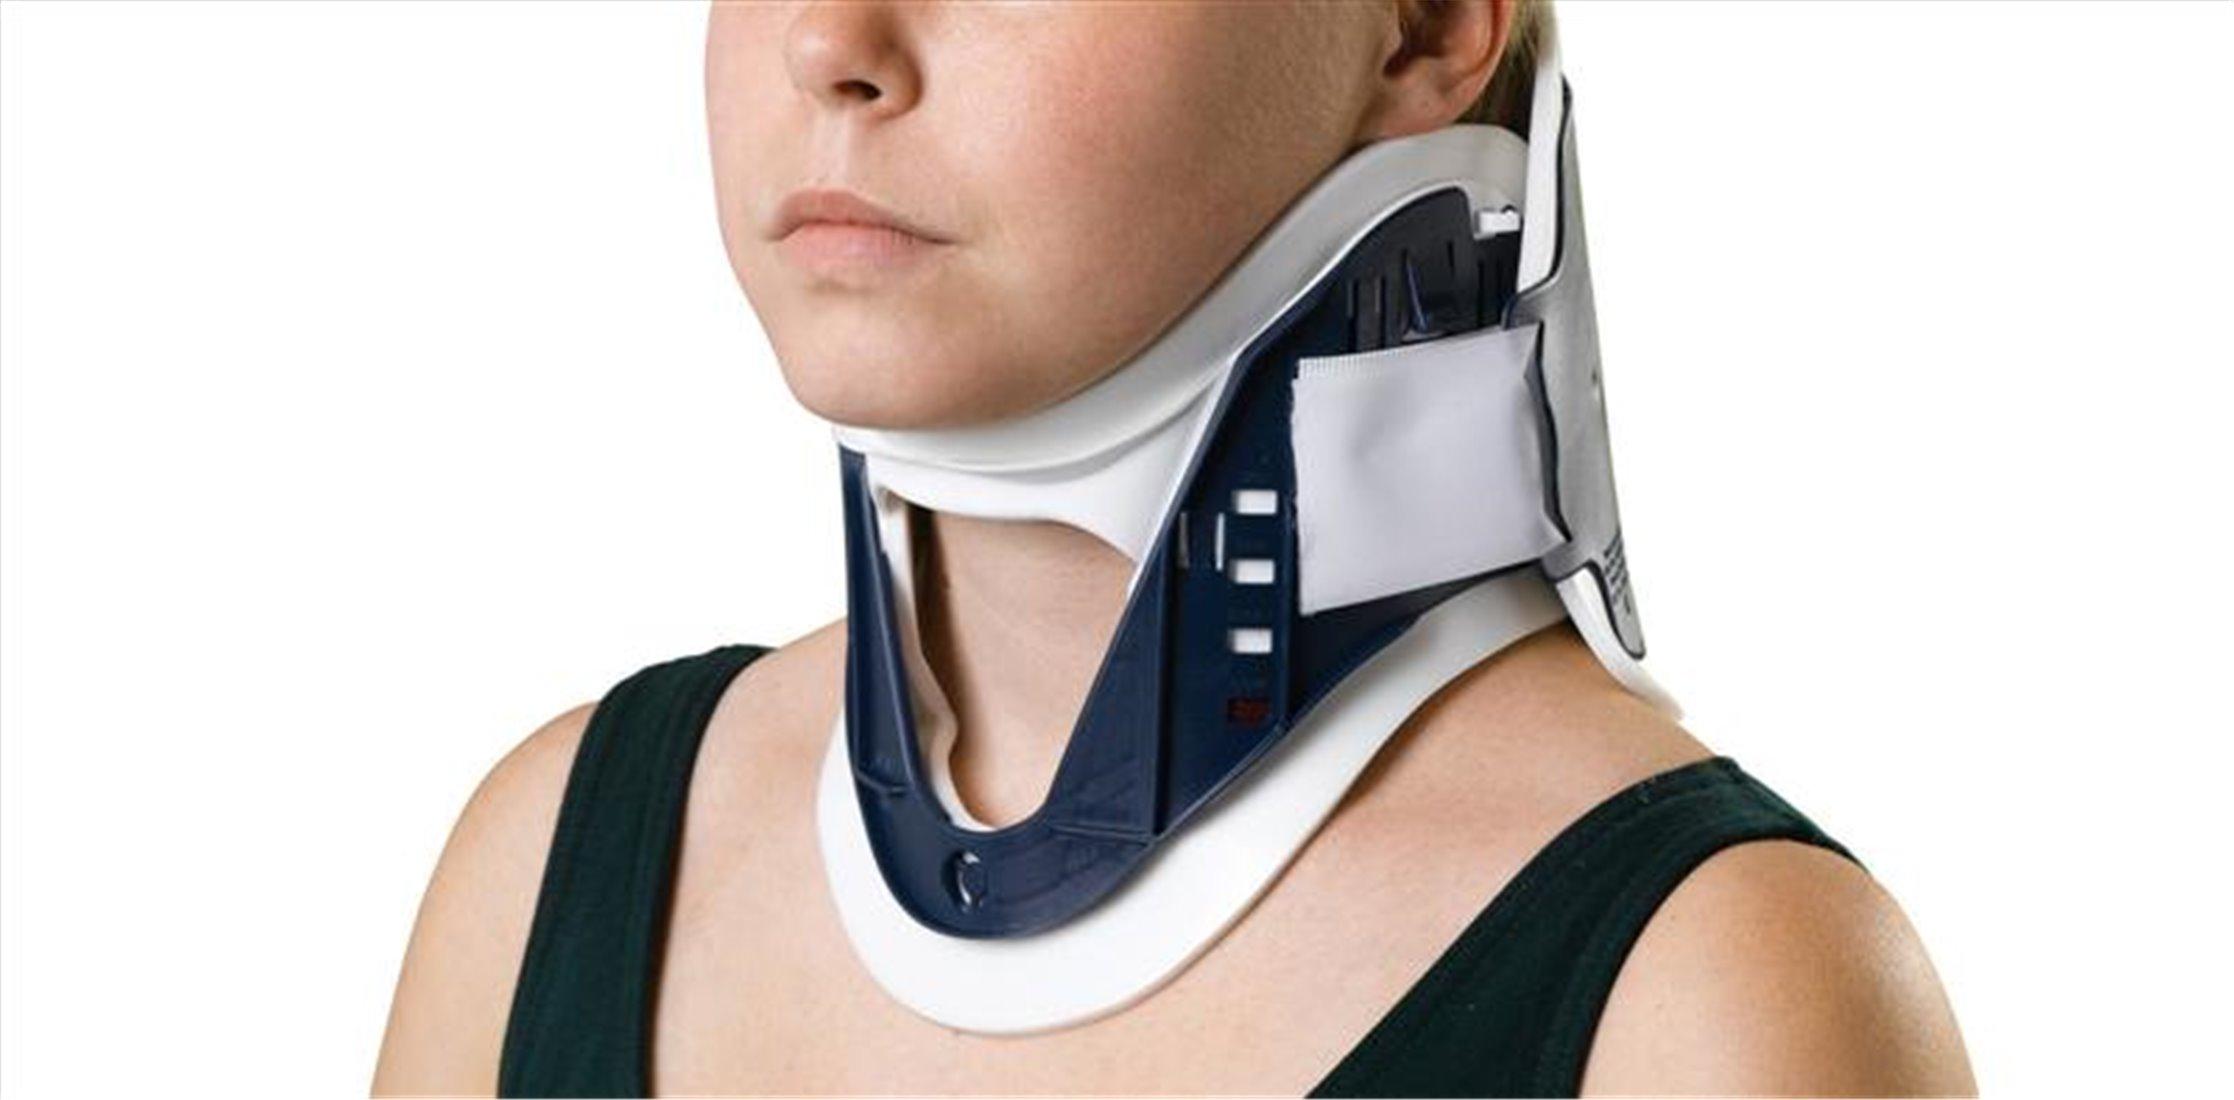 ossur-americas-philadelphia-patriot-one-piece-cervical-collars-universal-ort12000a